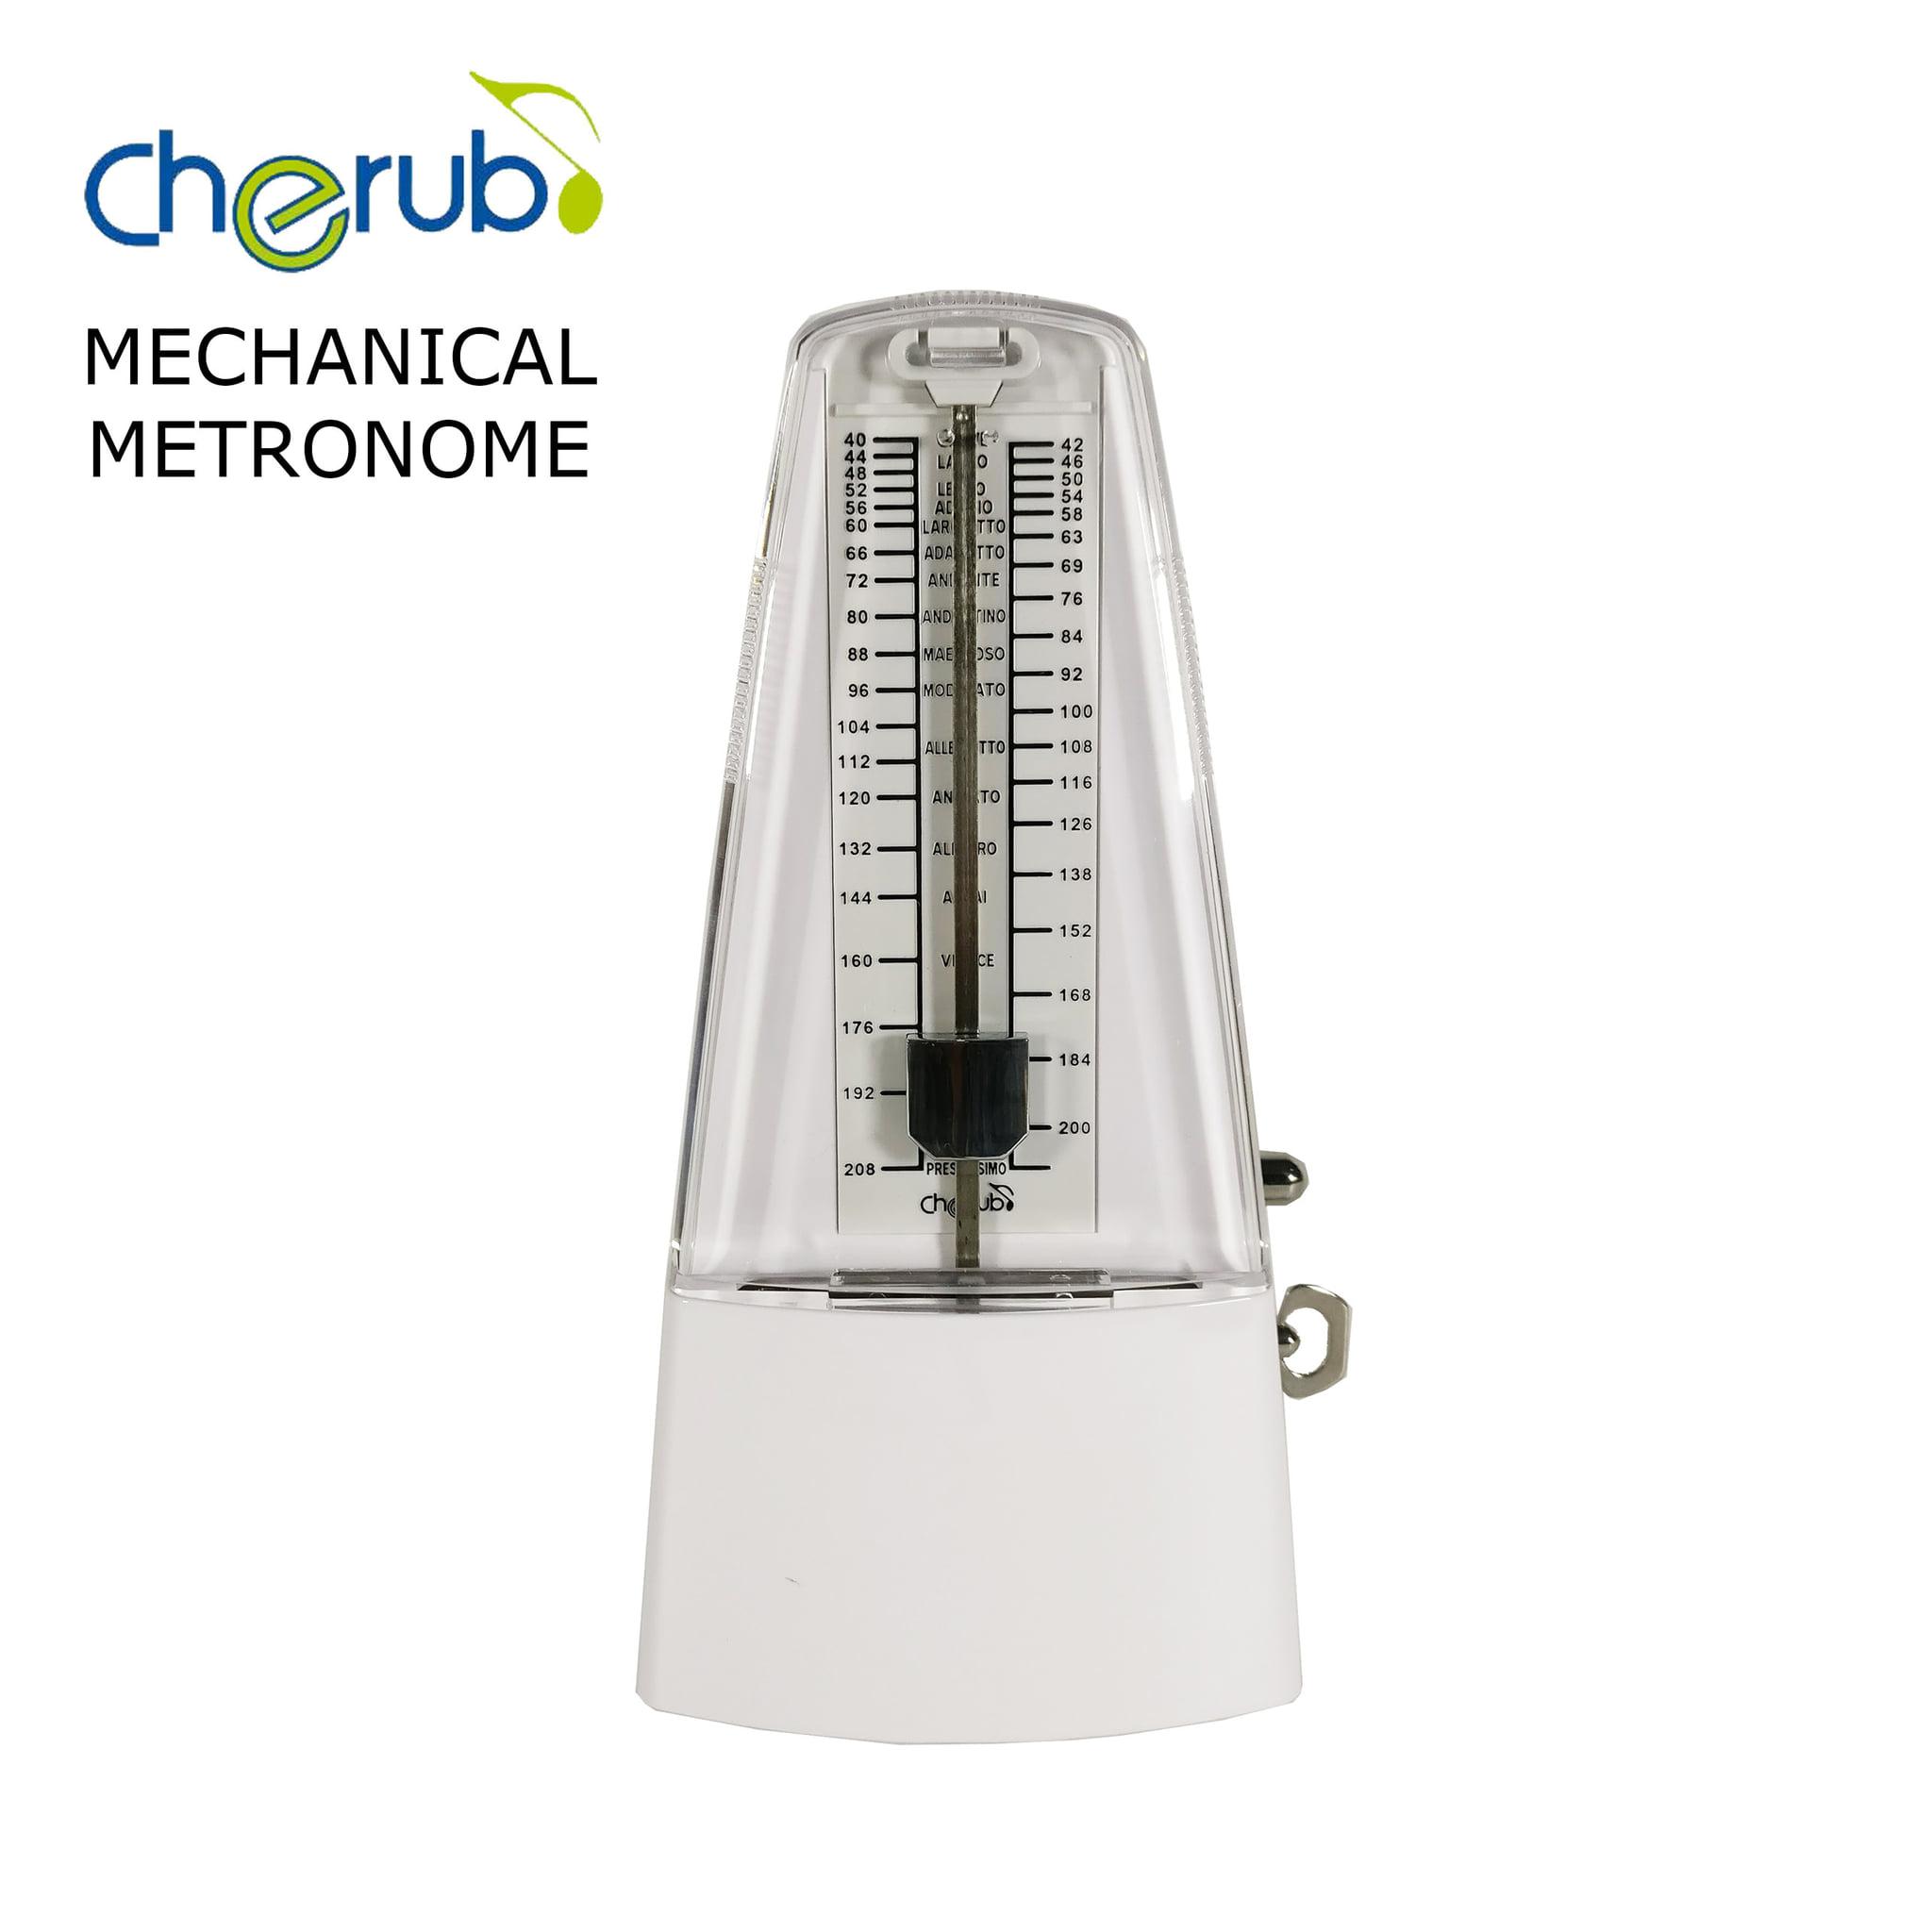 harga Metronome Mekanik Cherub Wsm - 330 White Blanja.com